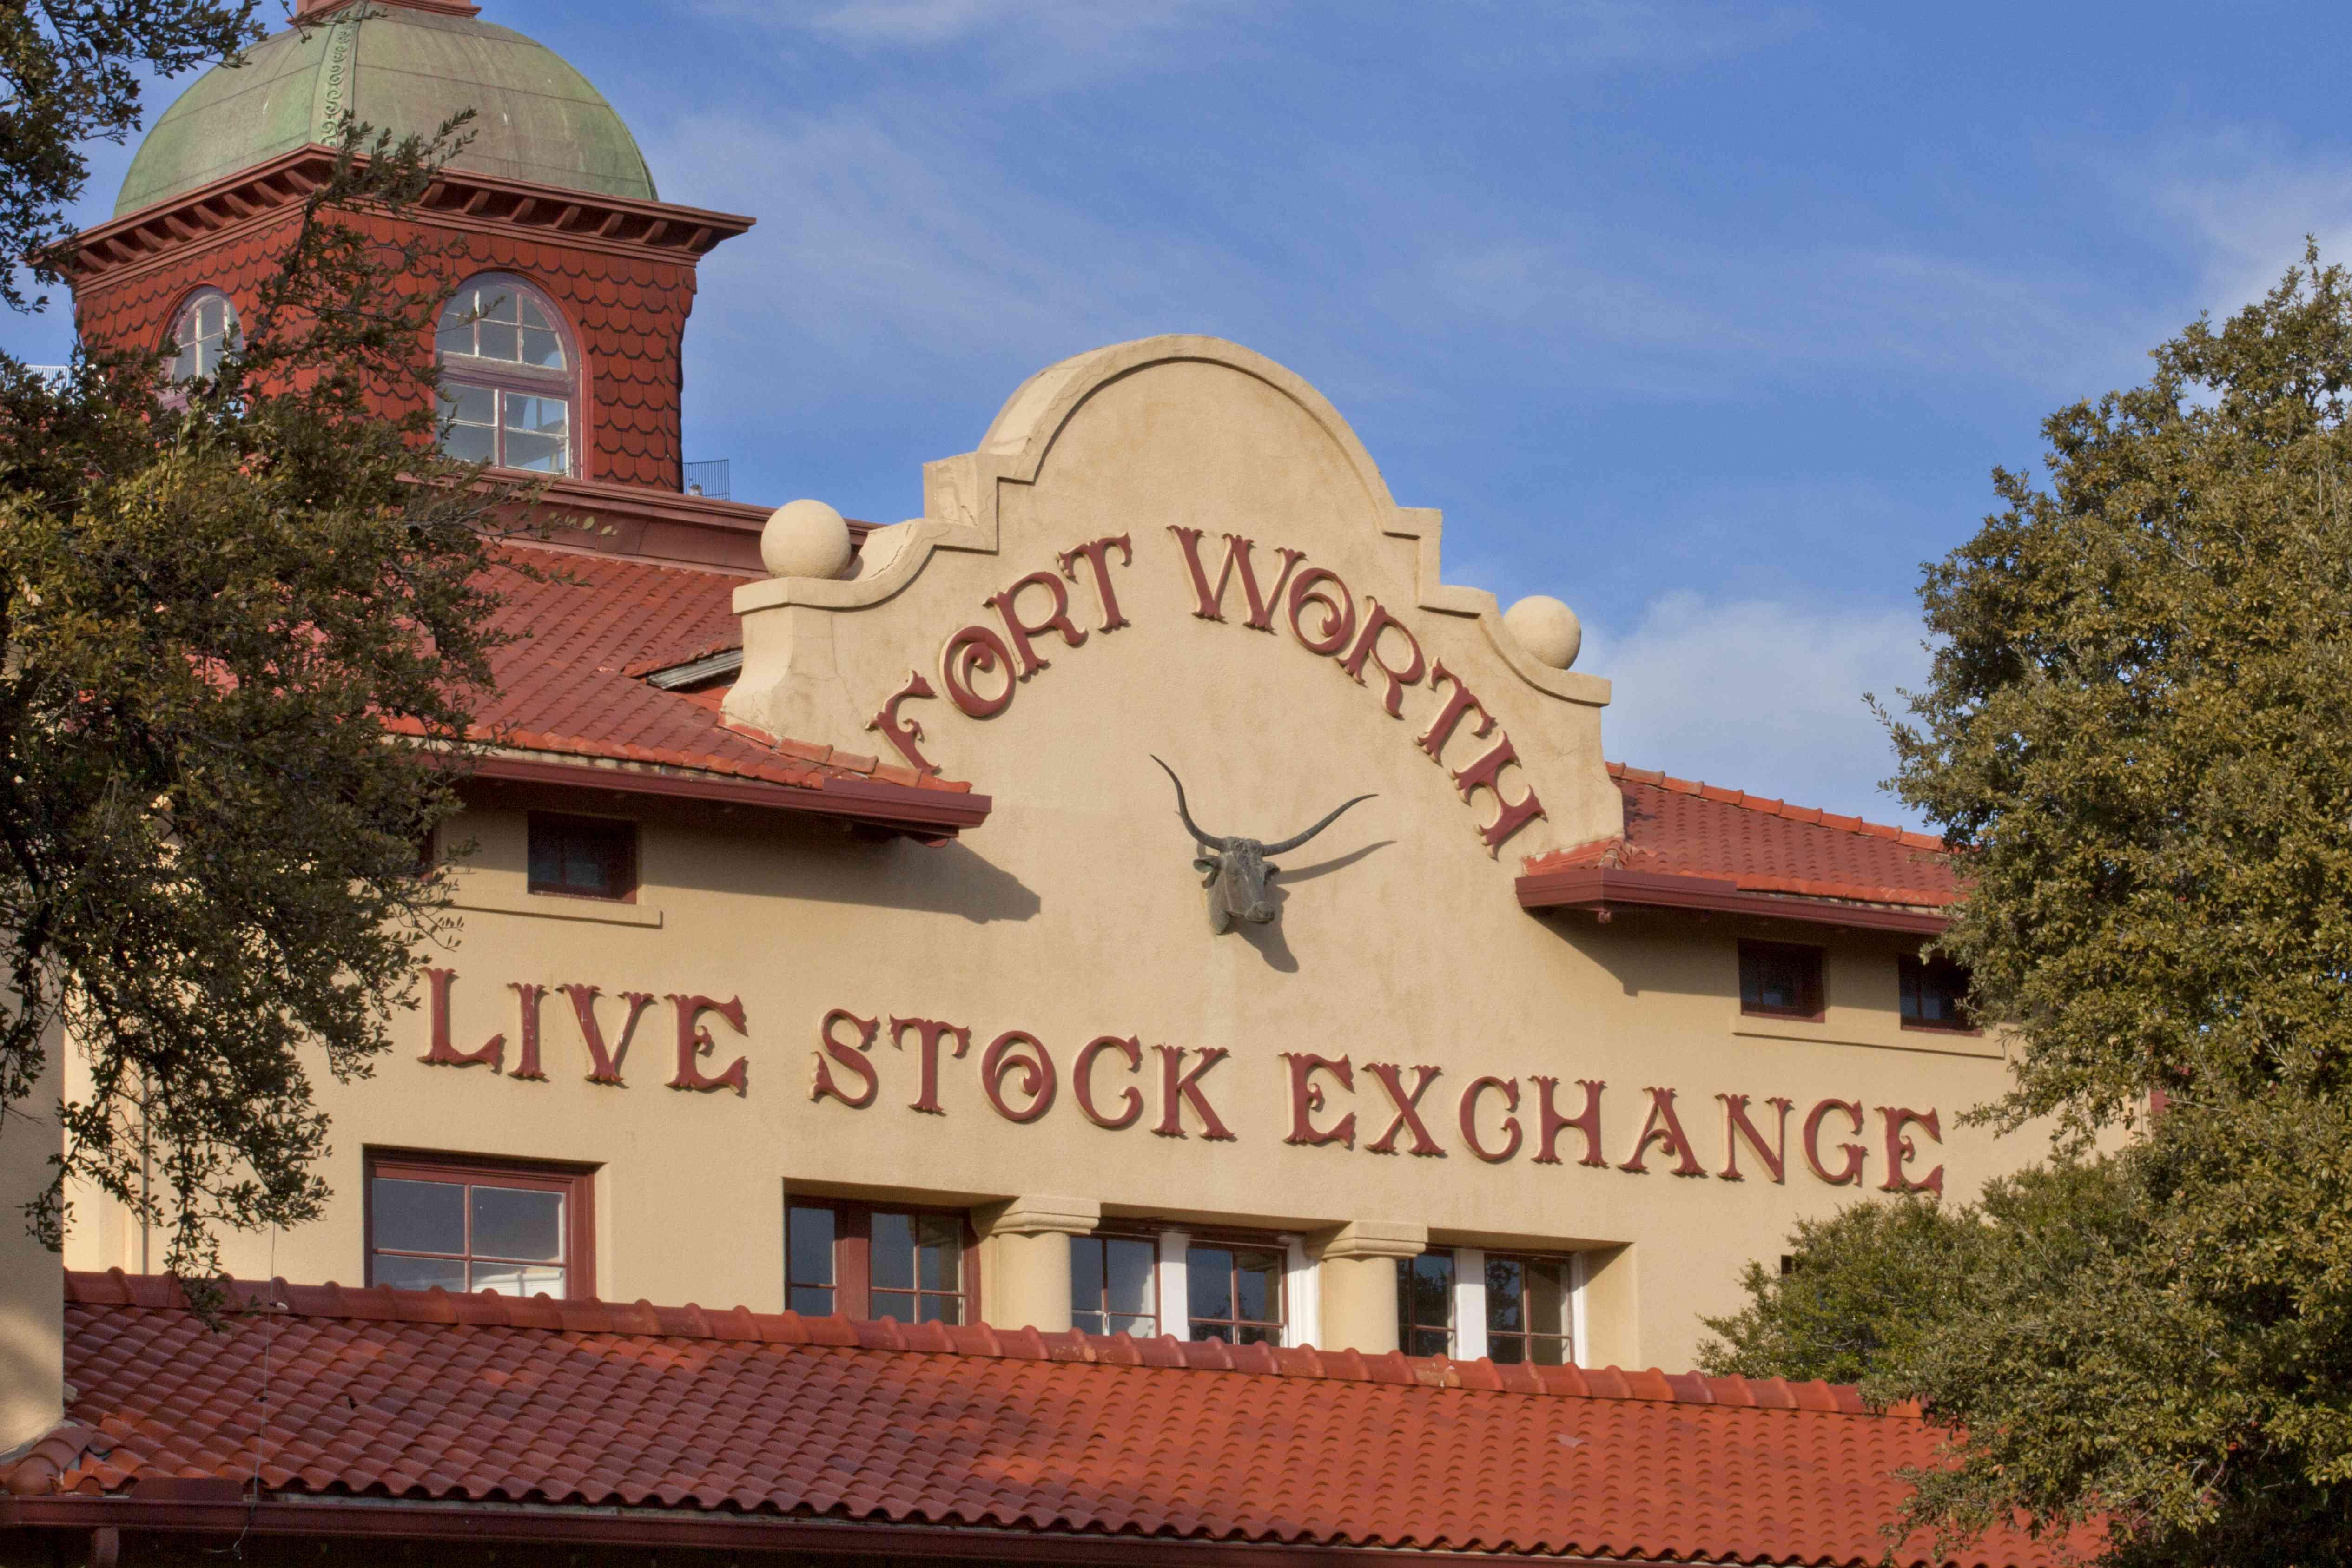 Fort Worth Live Stock Exchange building